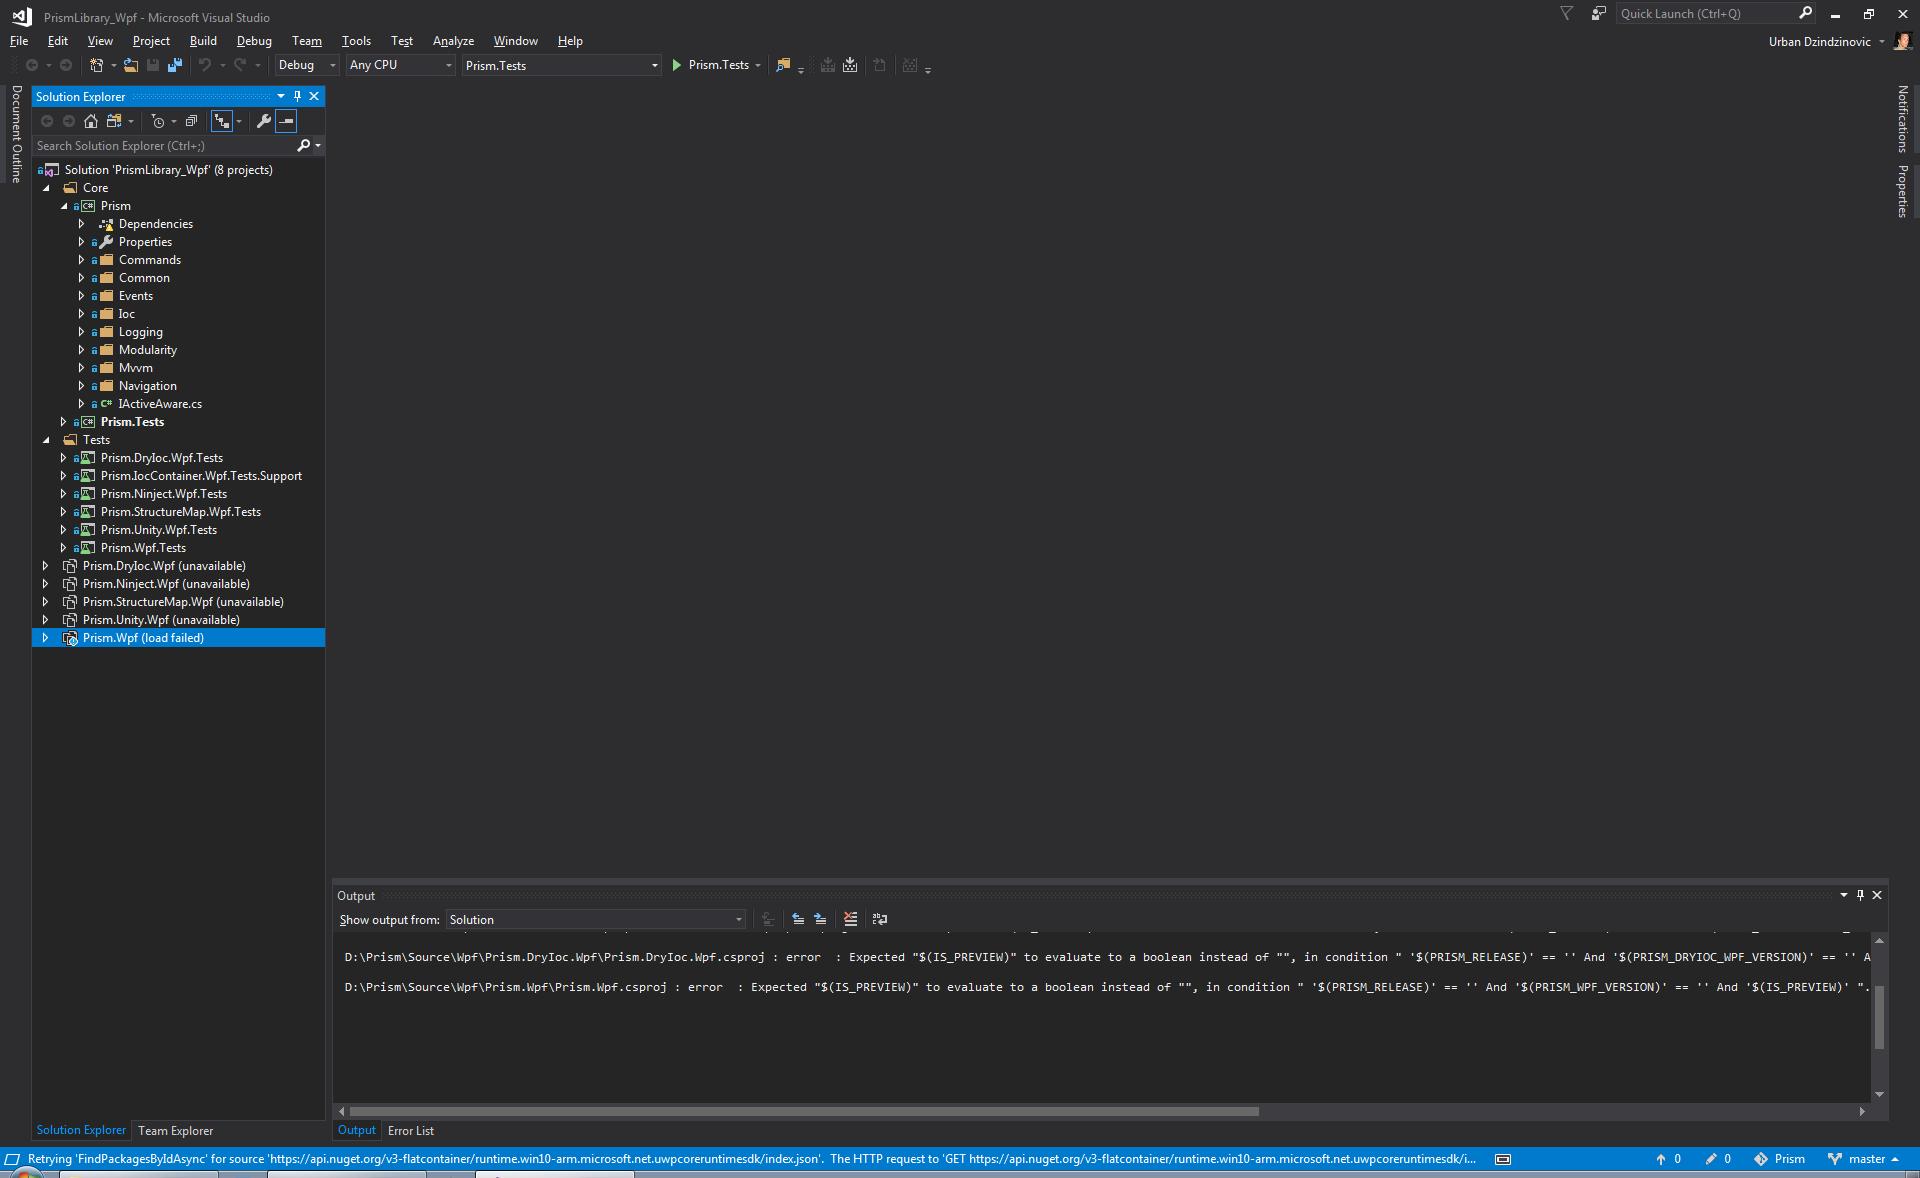 Prism Wpf csproj fails to load in Visual Studio · Issue